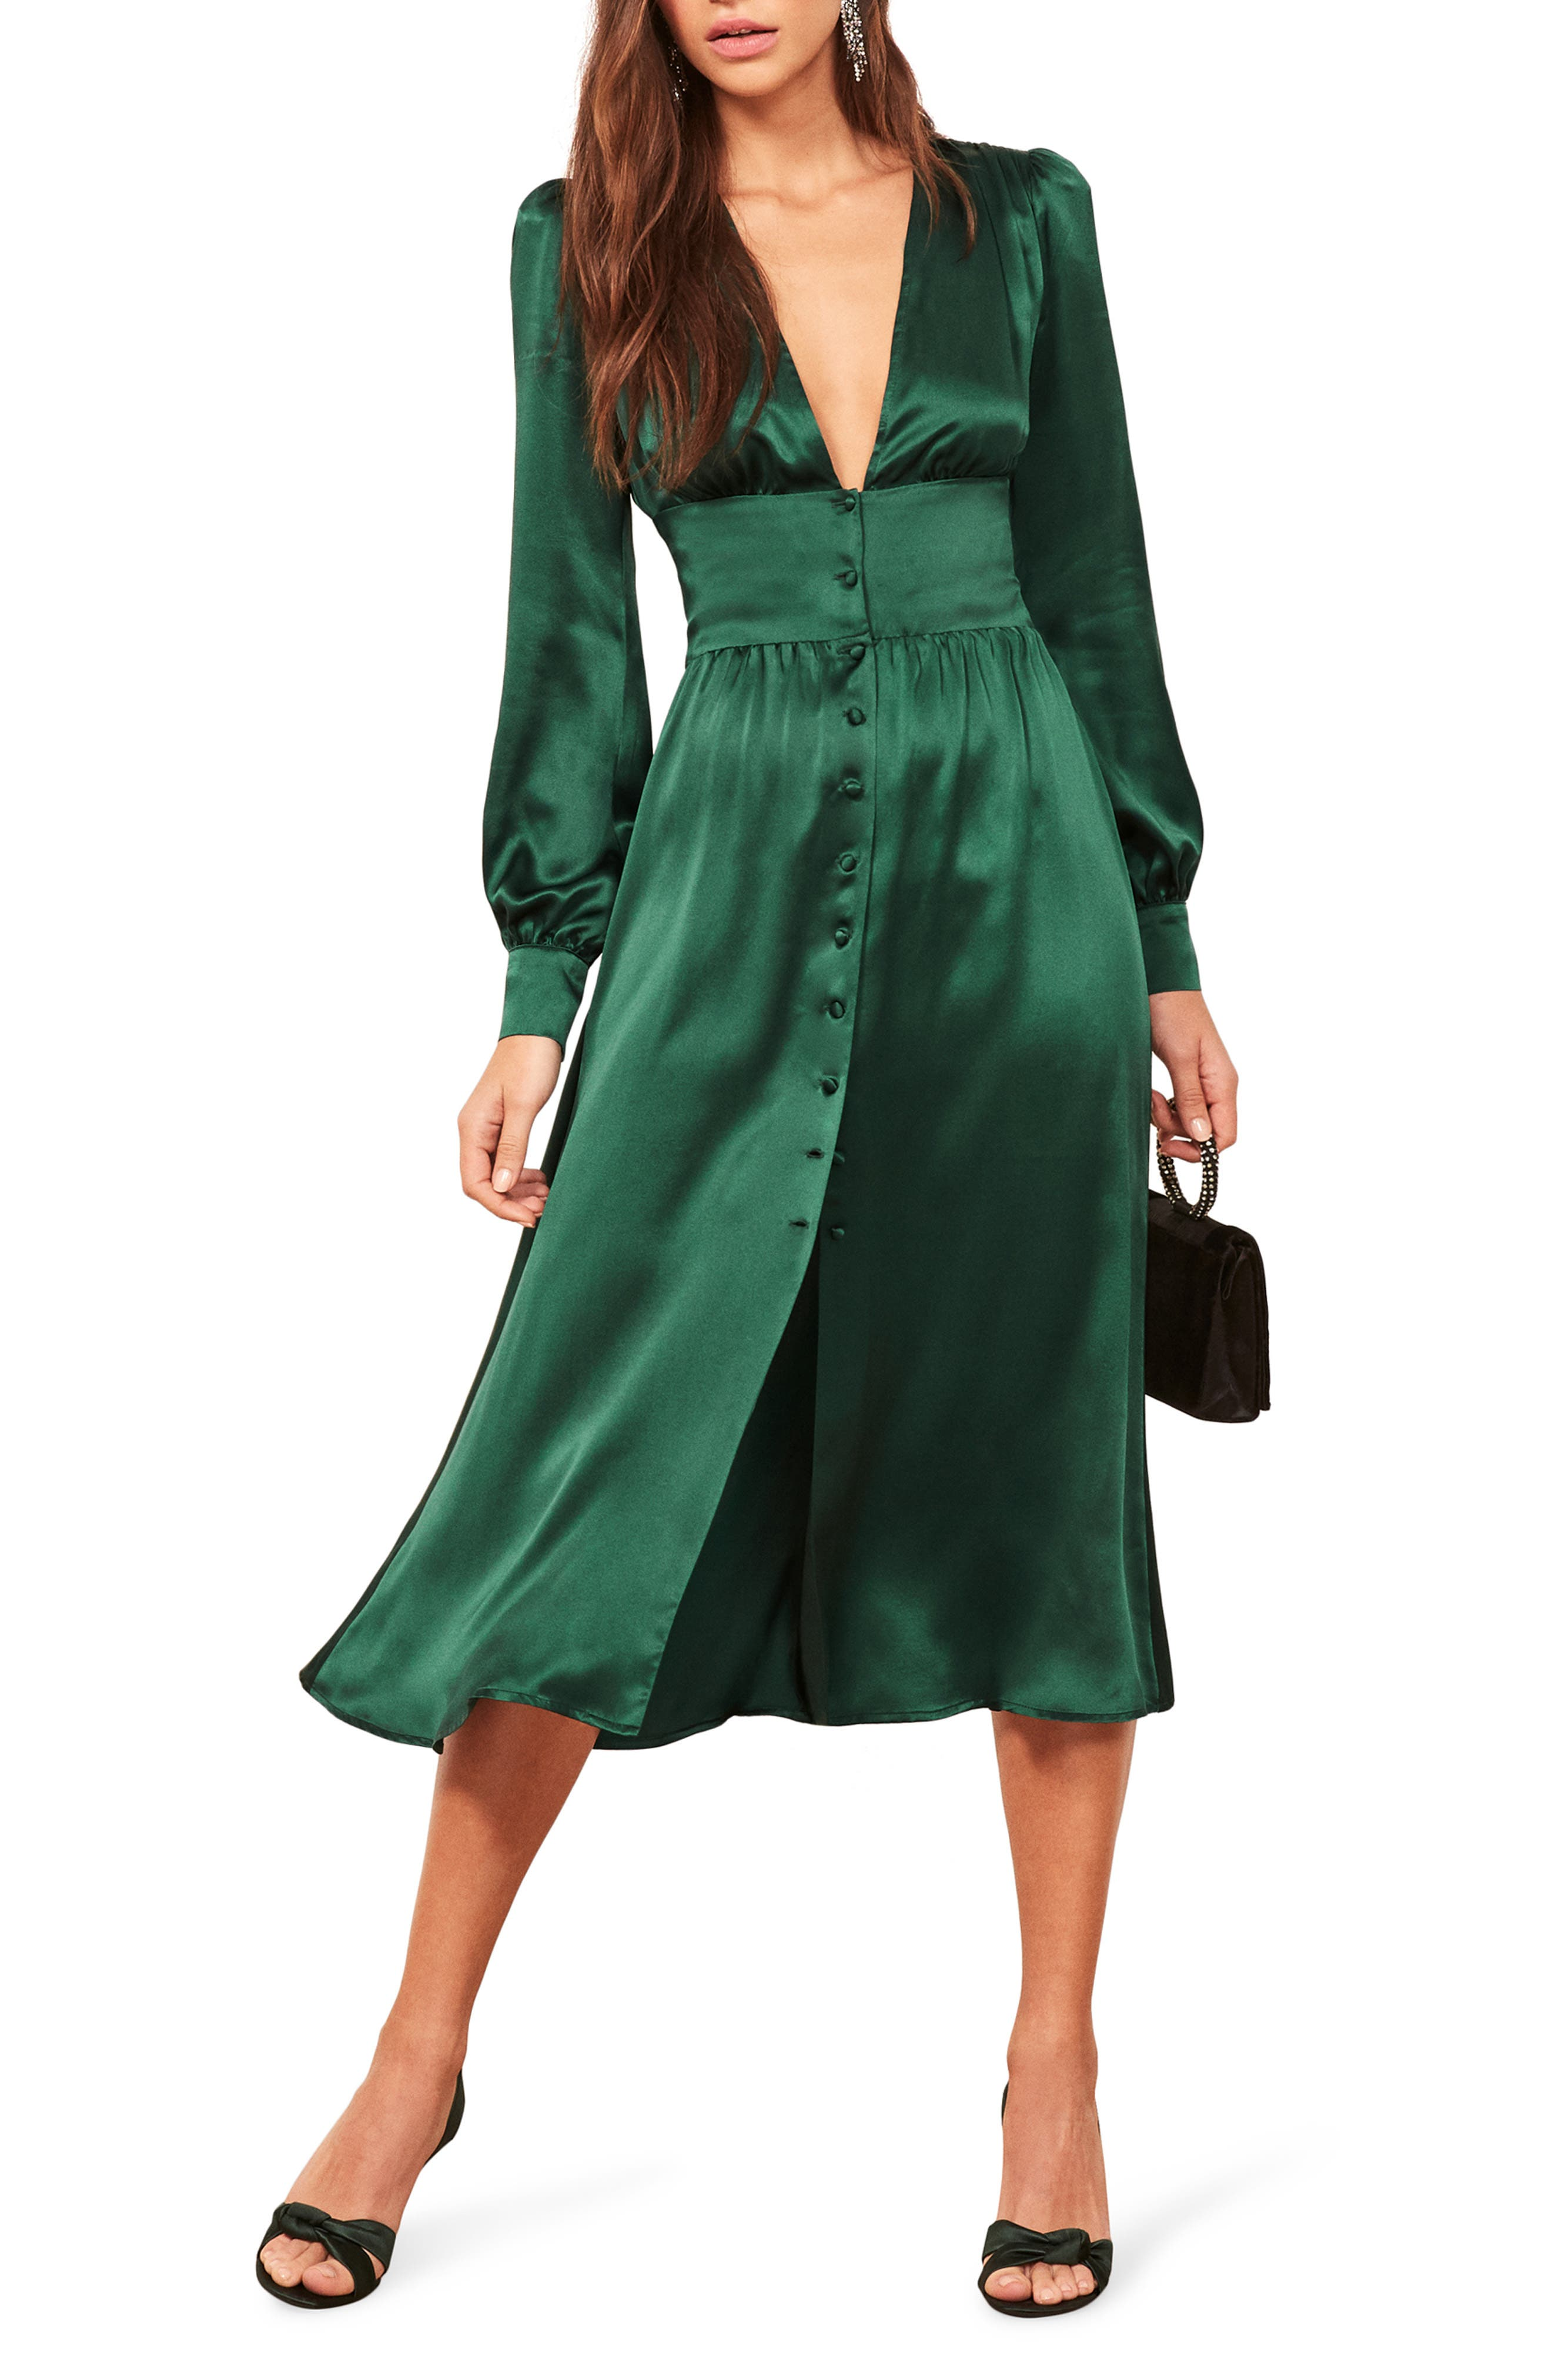 70s Prom, Formal, Evening, Party Dresses Womens Reformation Nicola Silk Midi Dress $278.00 AT vintagedancer.com